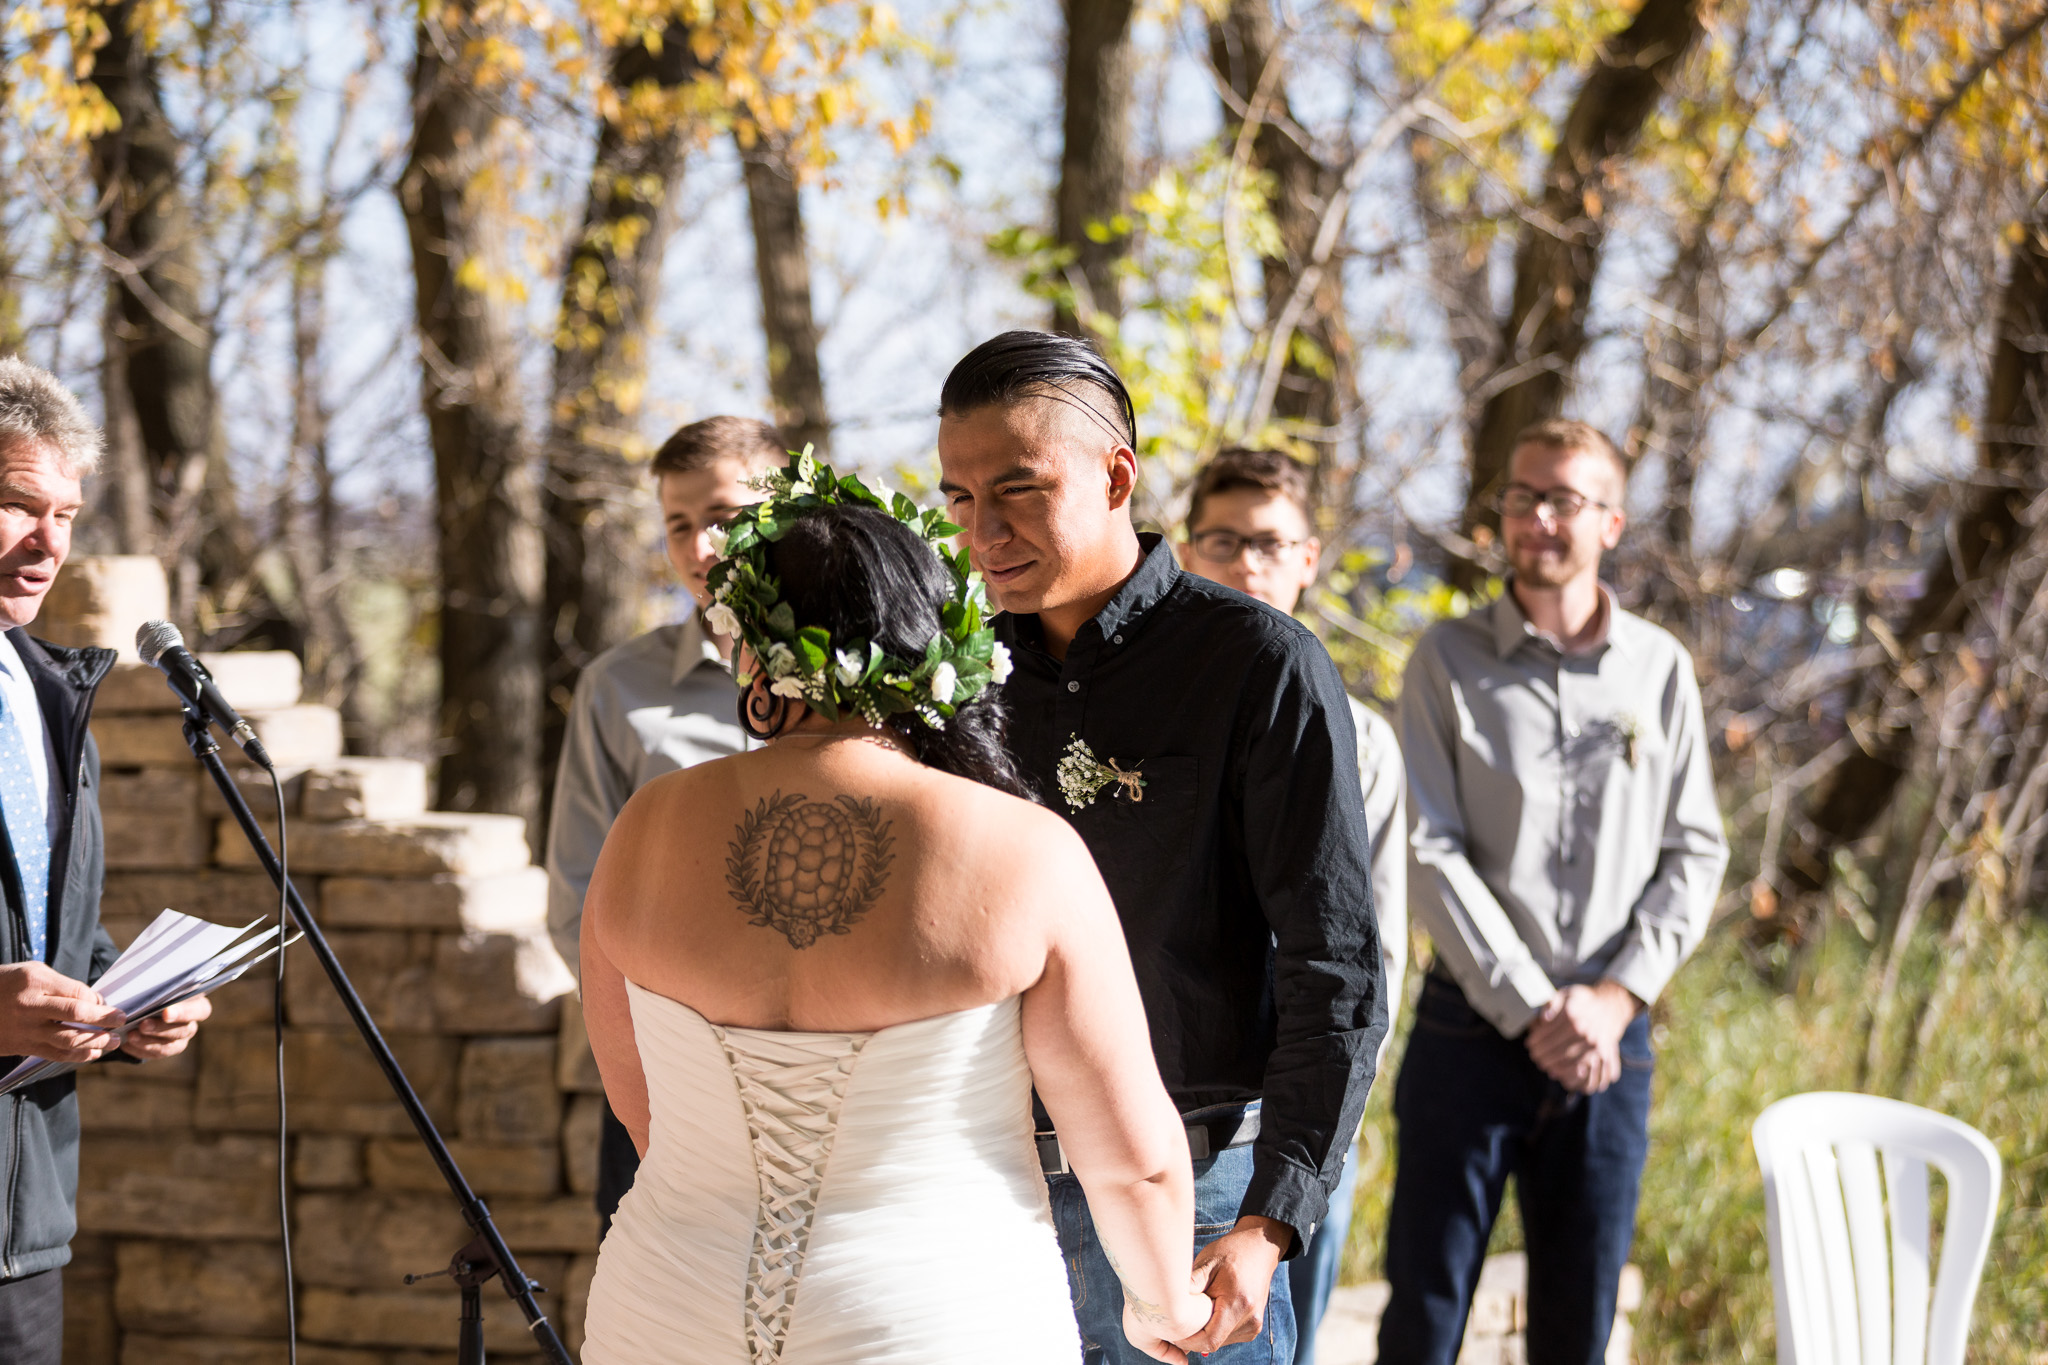 evergreen-village-winnipeg-wedding-21.jpg